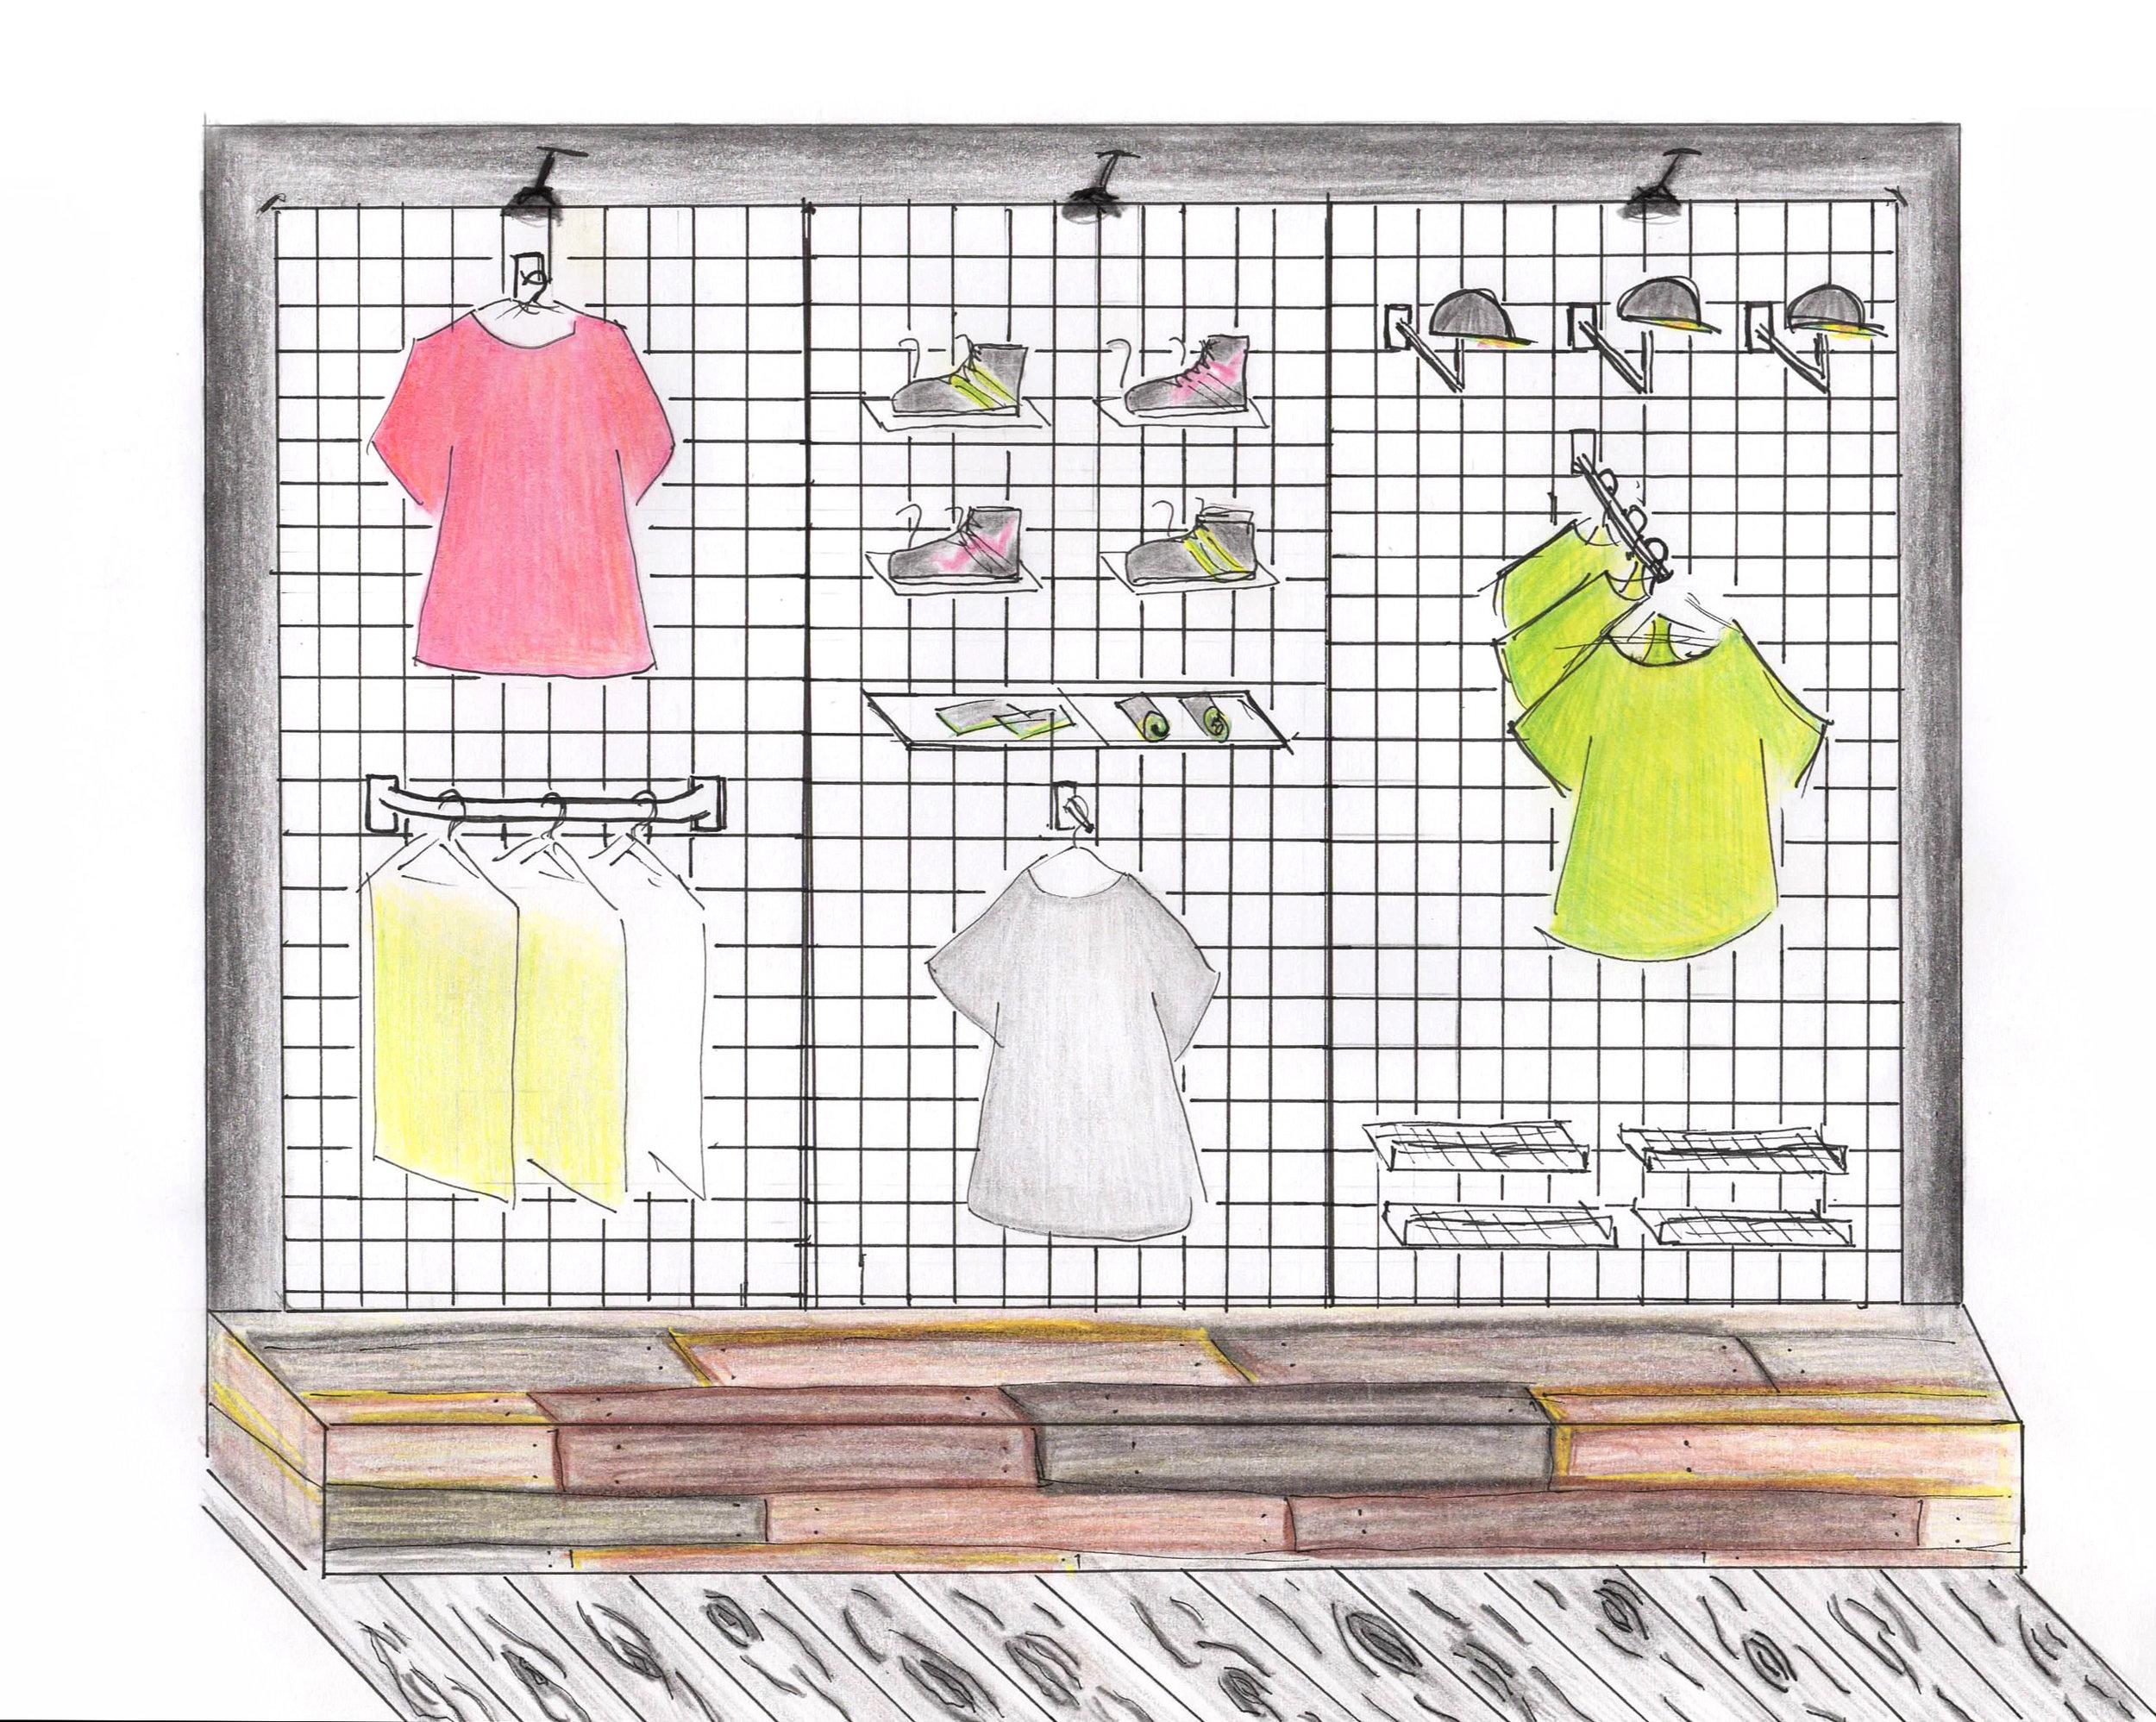 Urban sports shop sketch